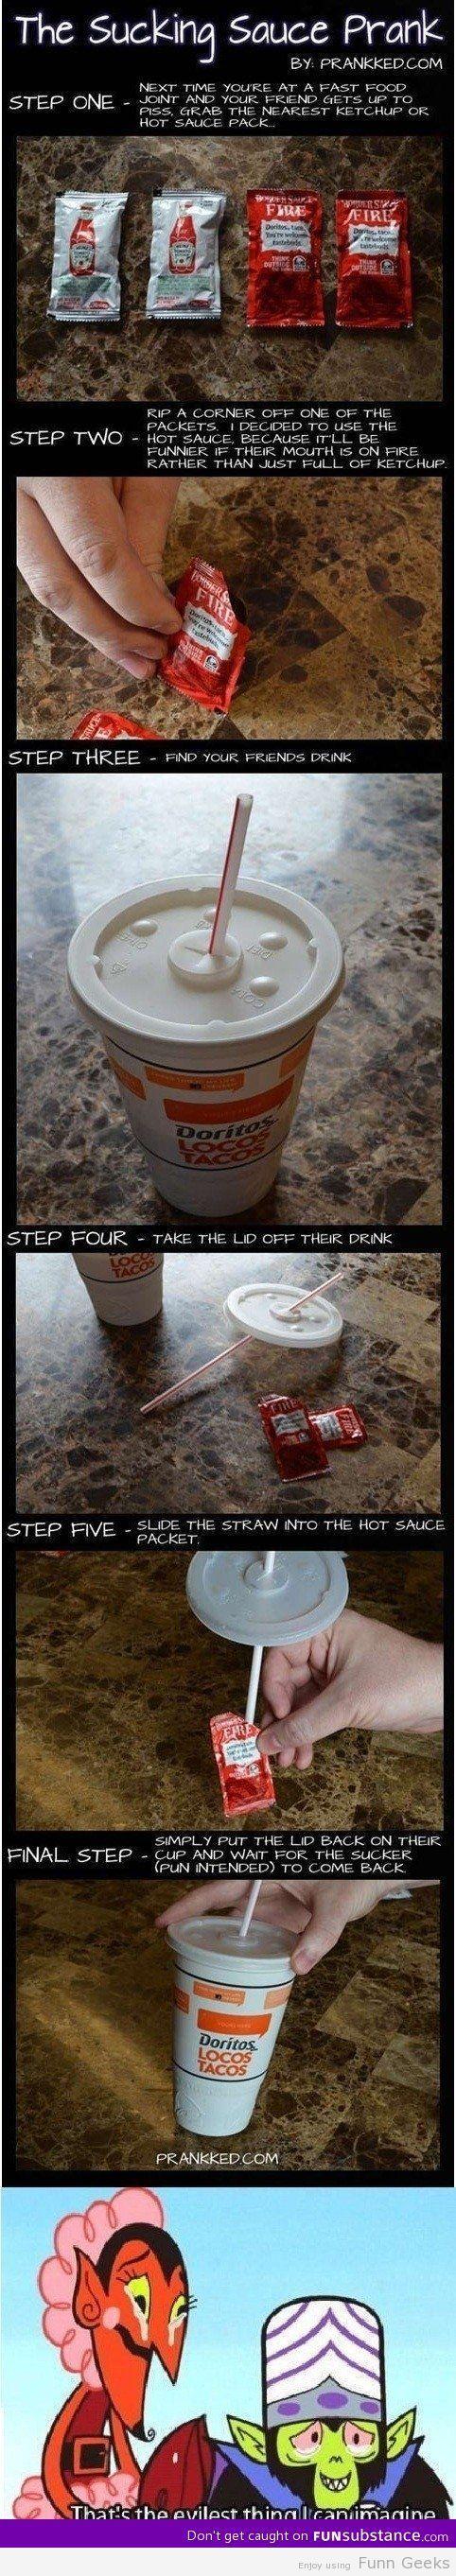 Sauce prank | Funn Geeks